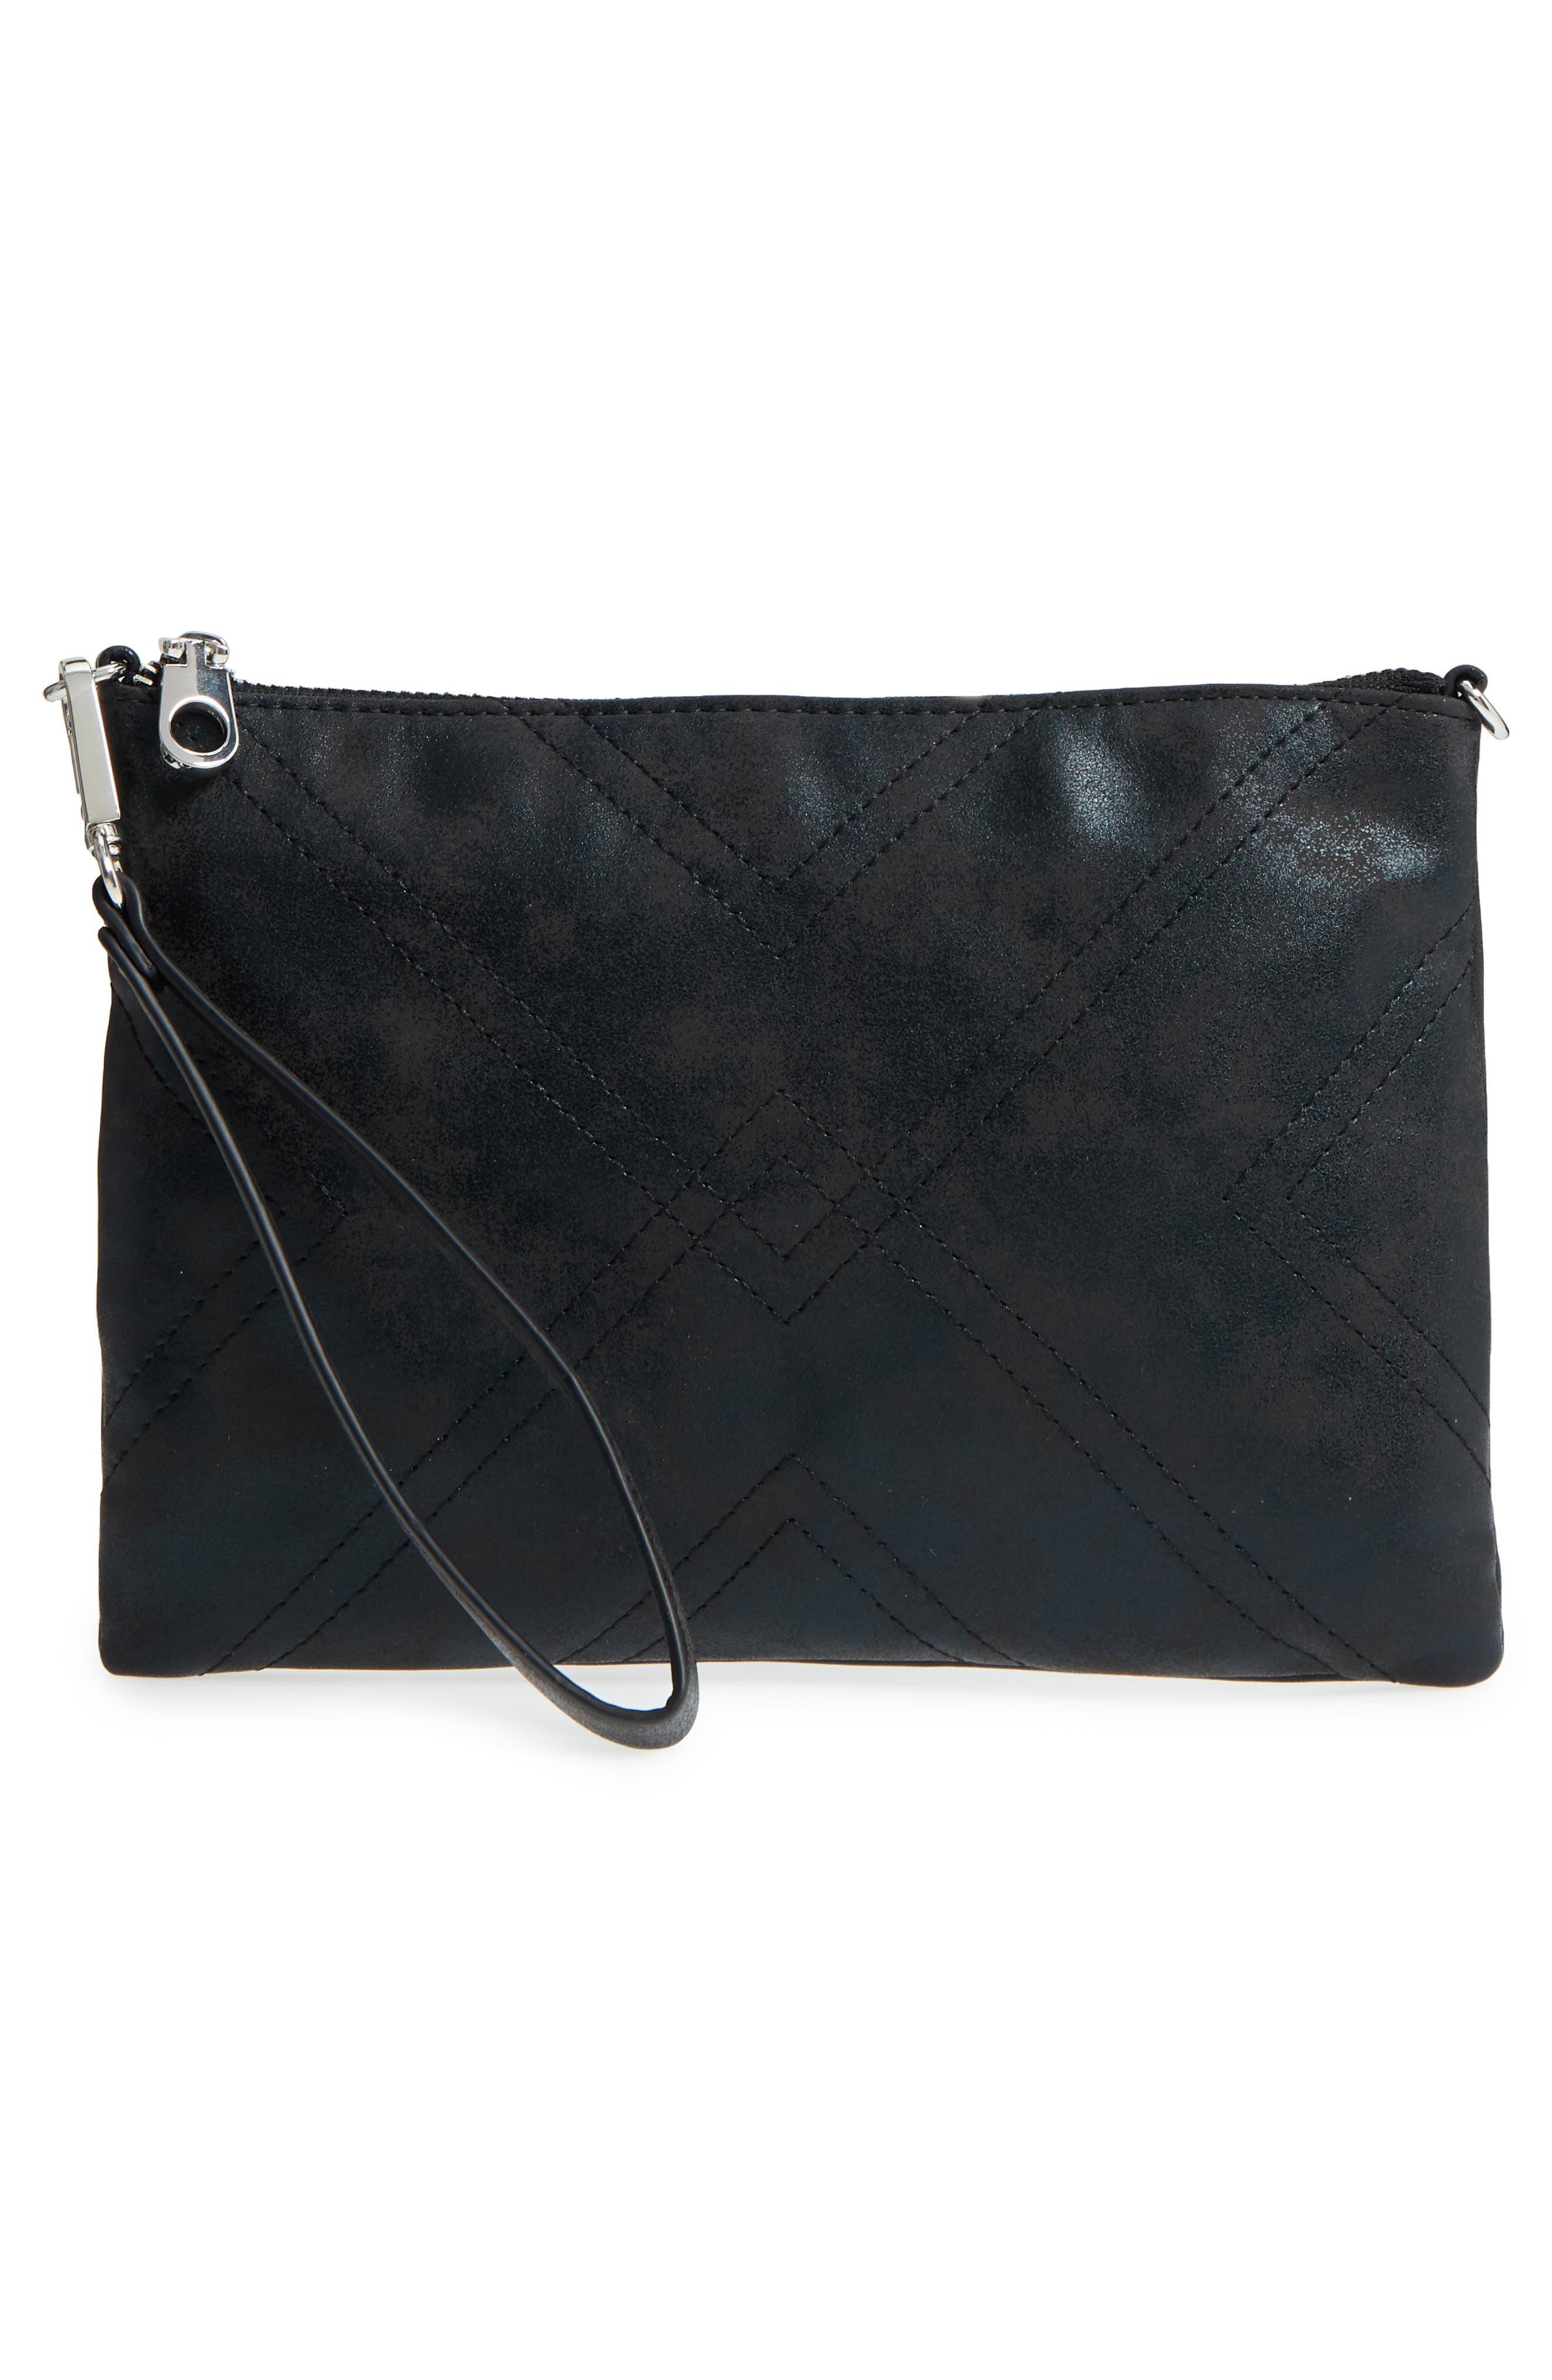 Astley Faux Leather Clutch,                             Alternate thumbnail 7, color,